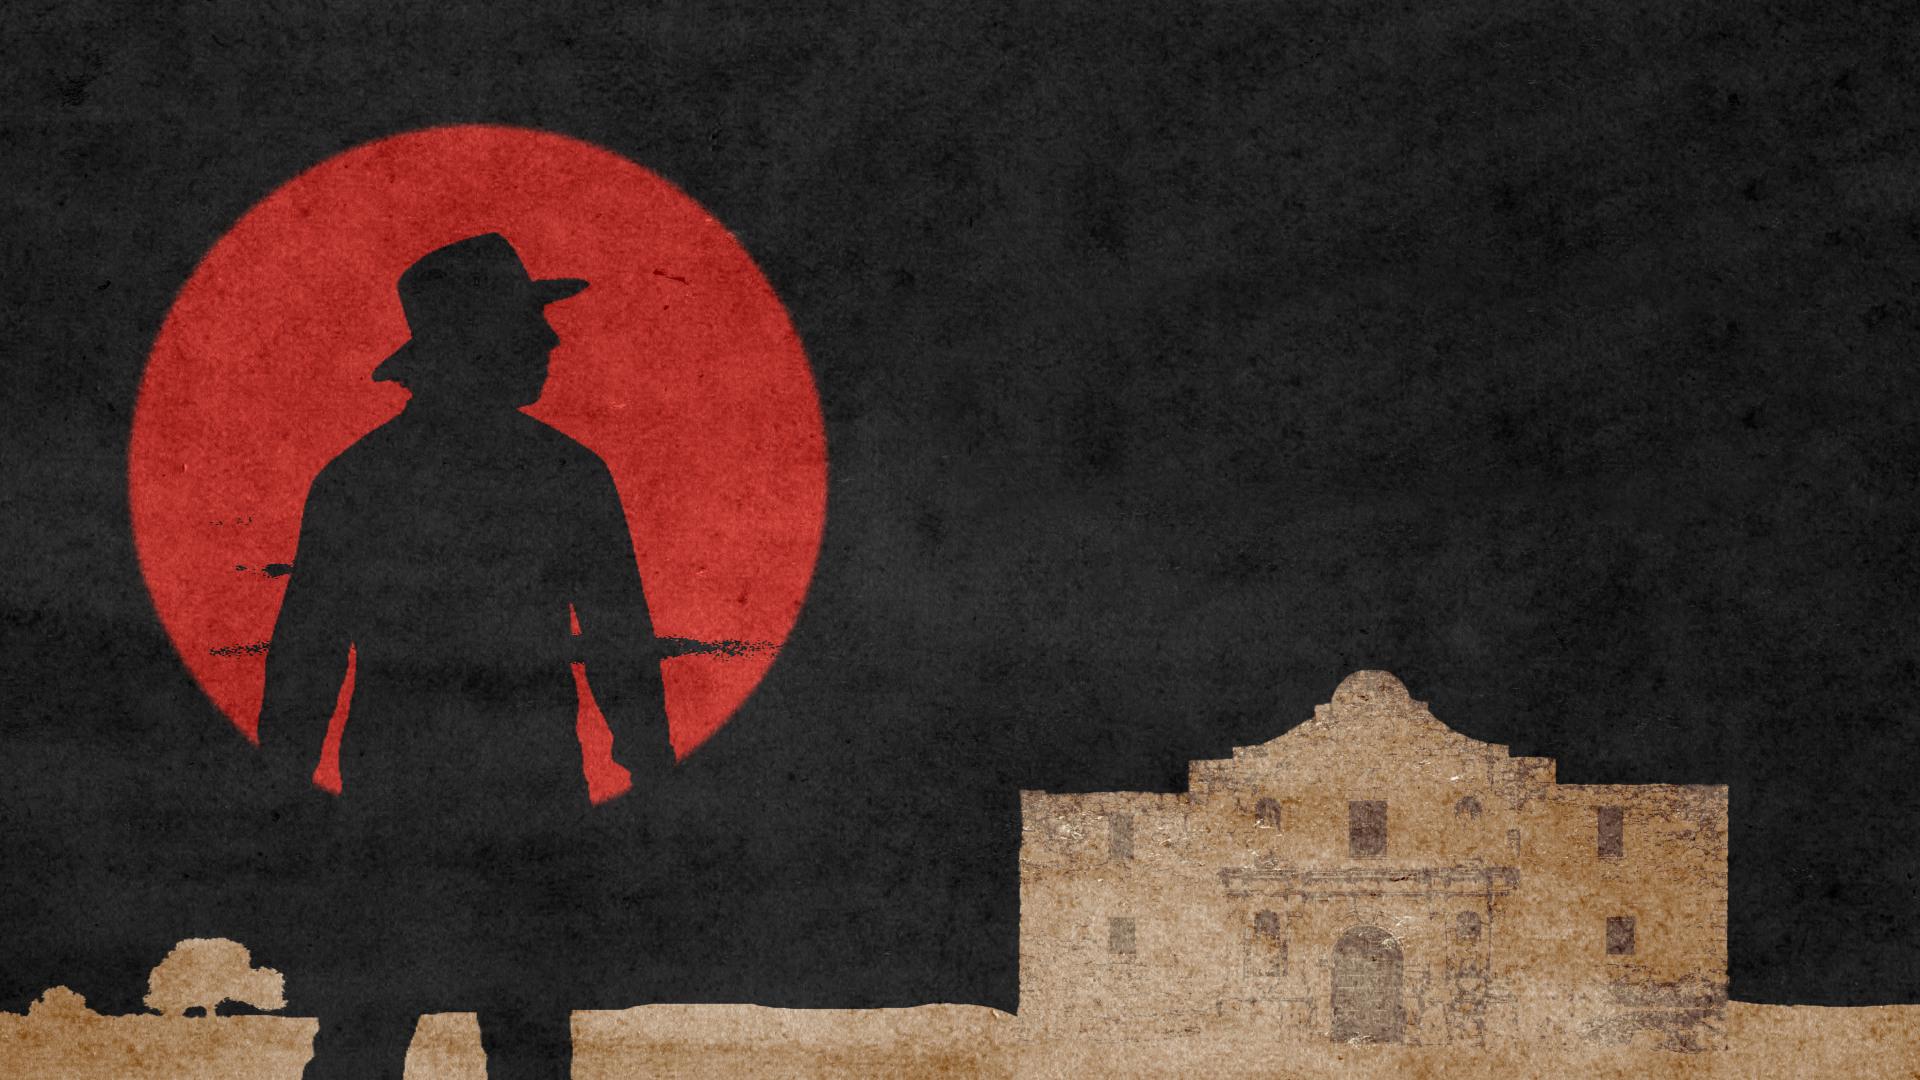 The Alamo Battle Of The Alamo Texas Revolution Flocabulary